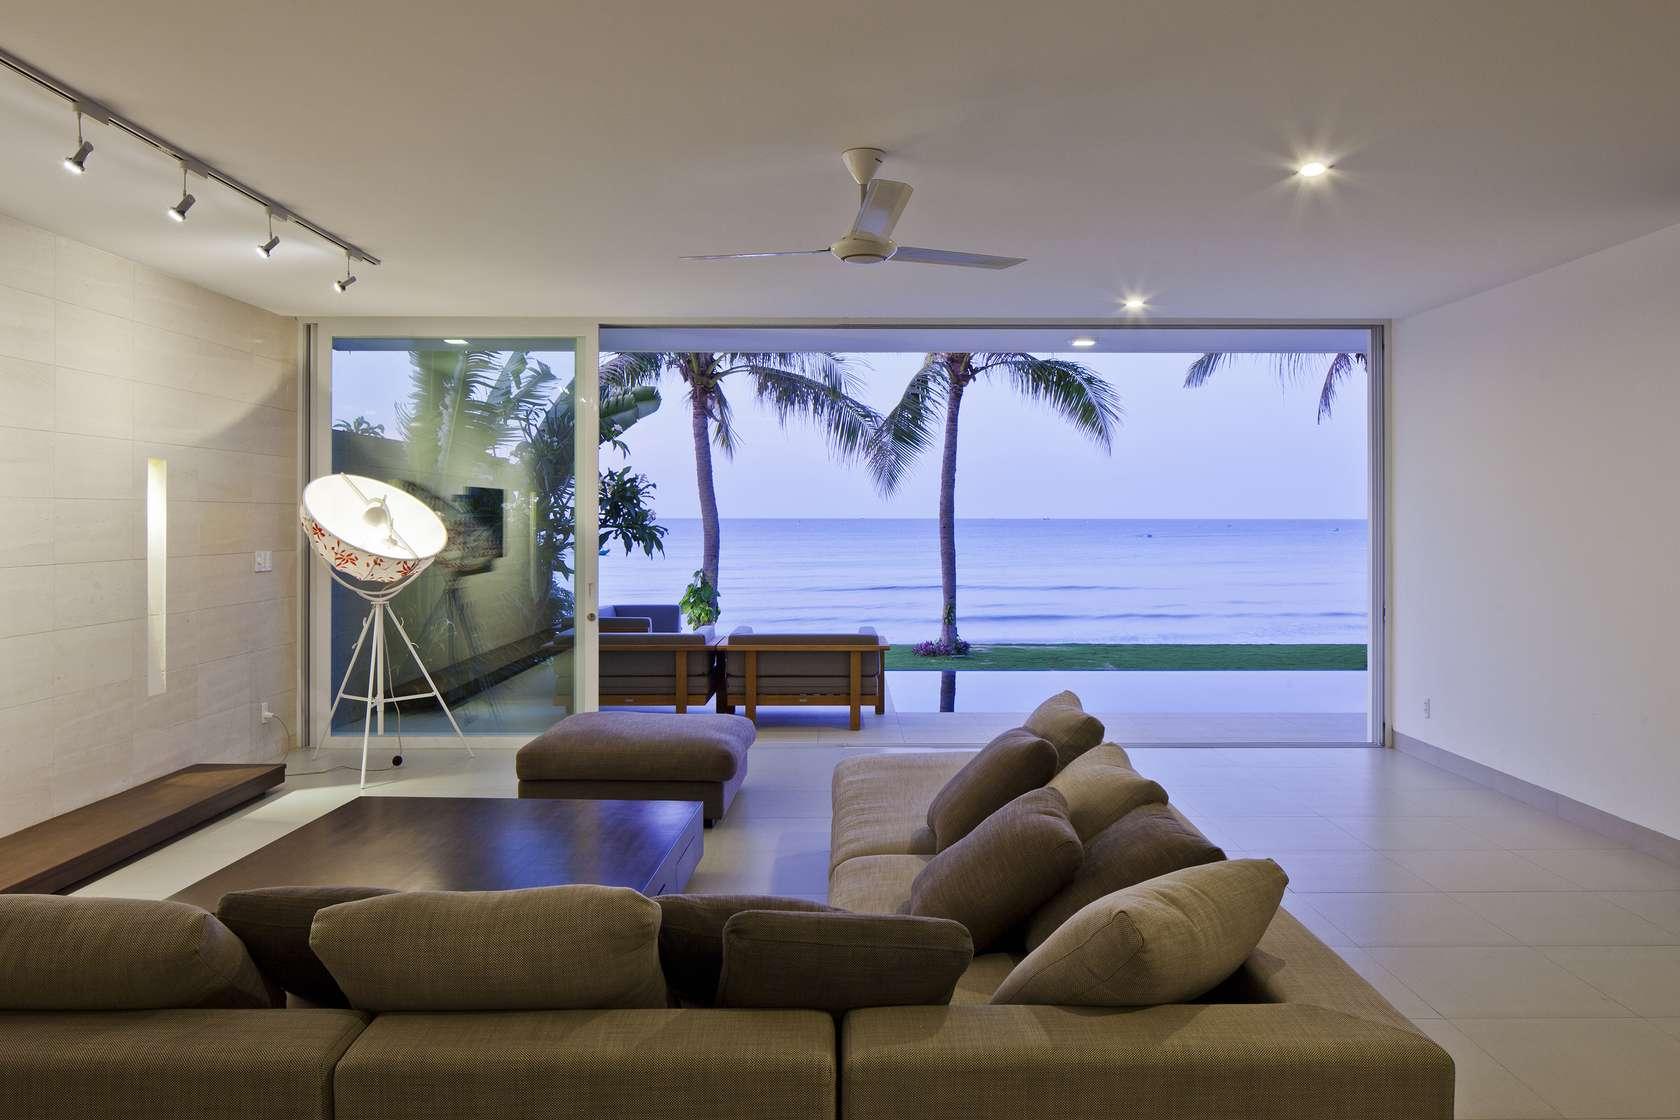 Private Beach Villas Offer Spectacular Ocean Views And